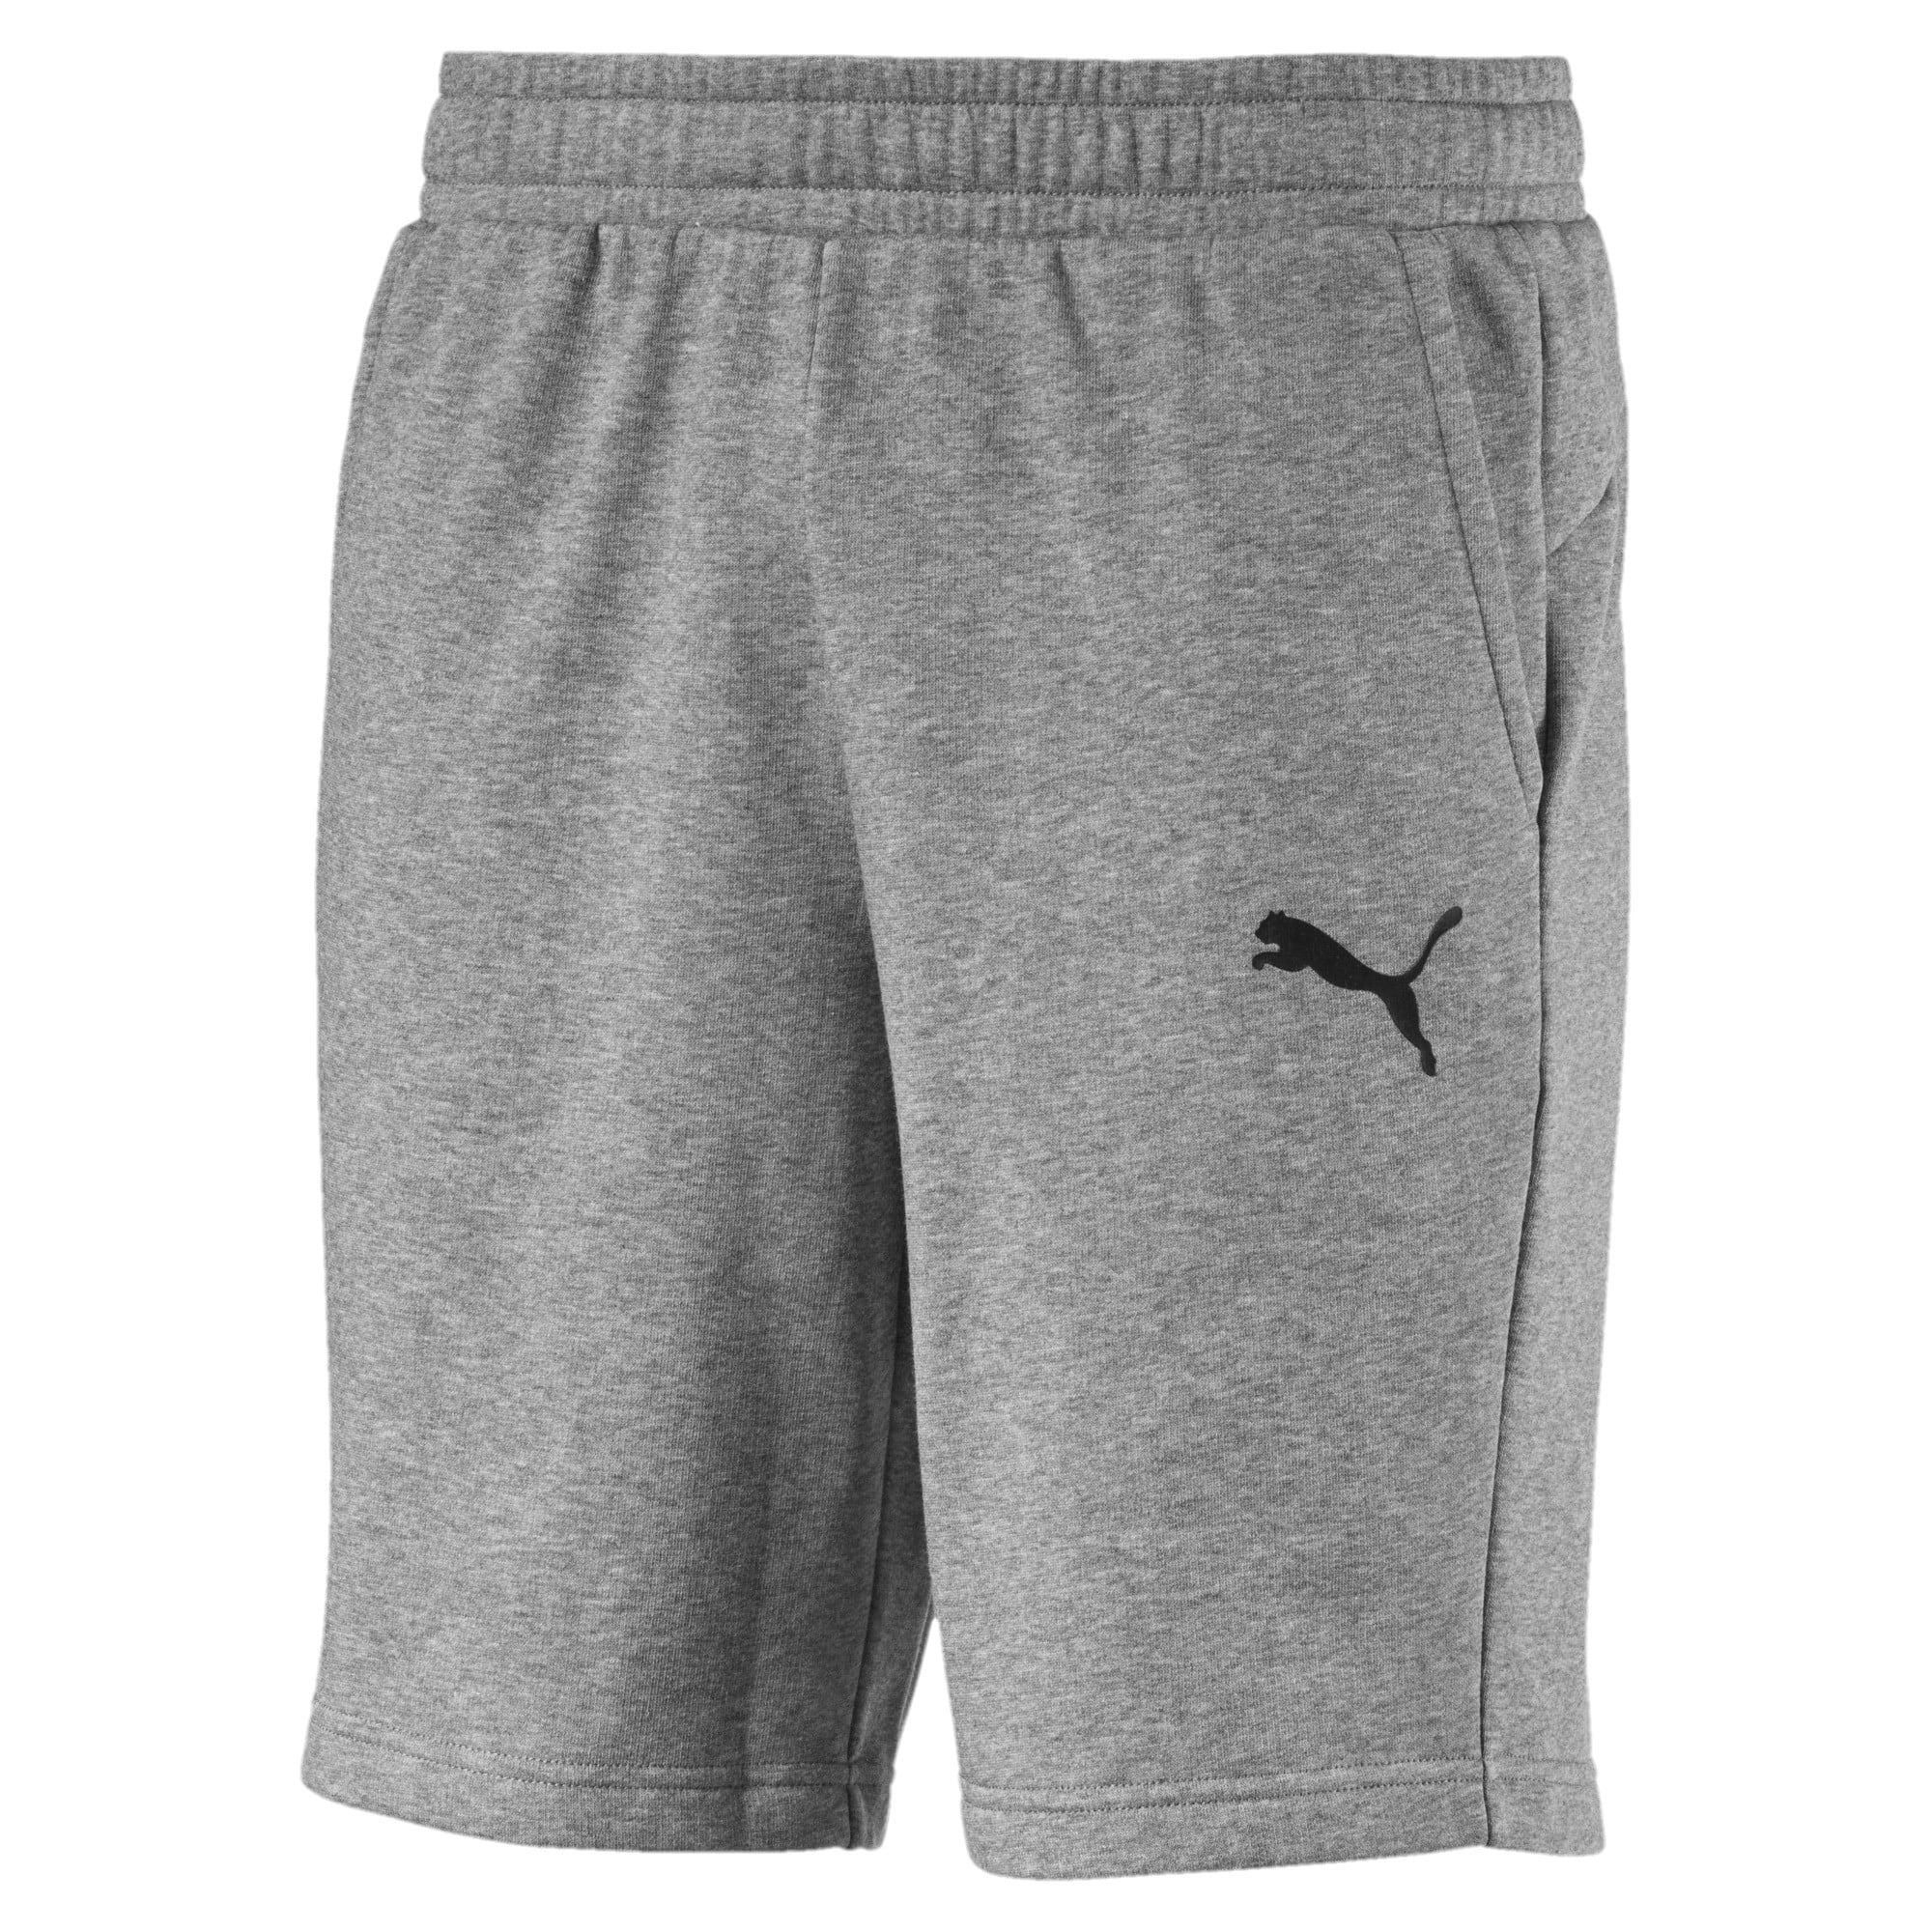 Miniatura 1 de Shorts deportivos Essentials para hombre, Medium Gray Heather-Cat, mediano